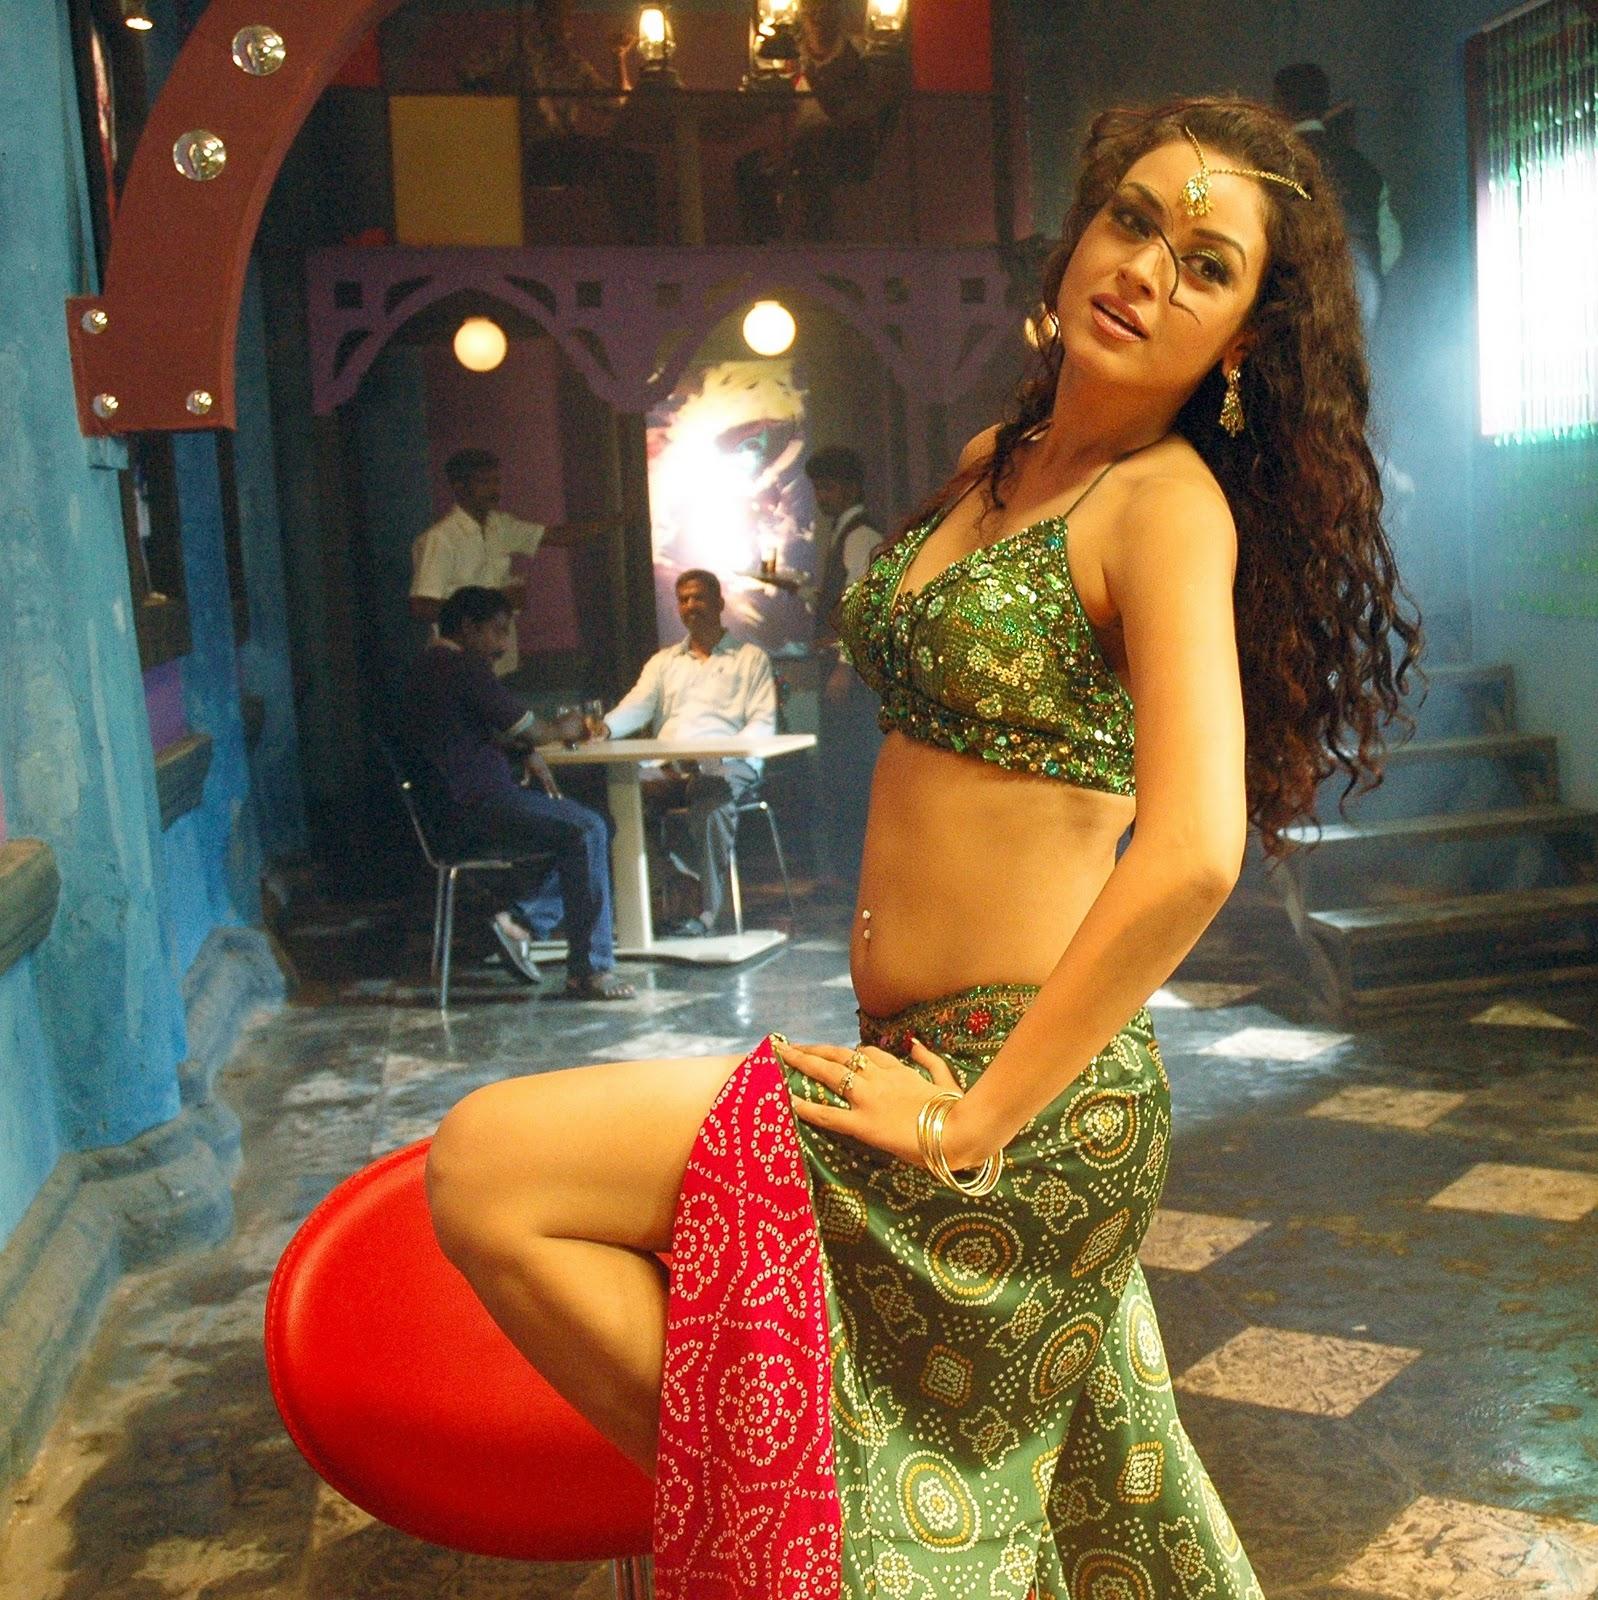 Nagaram Marupakkam actress Anuya hot stills Nagaram heroine Anuya sexy photos cleavage